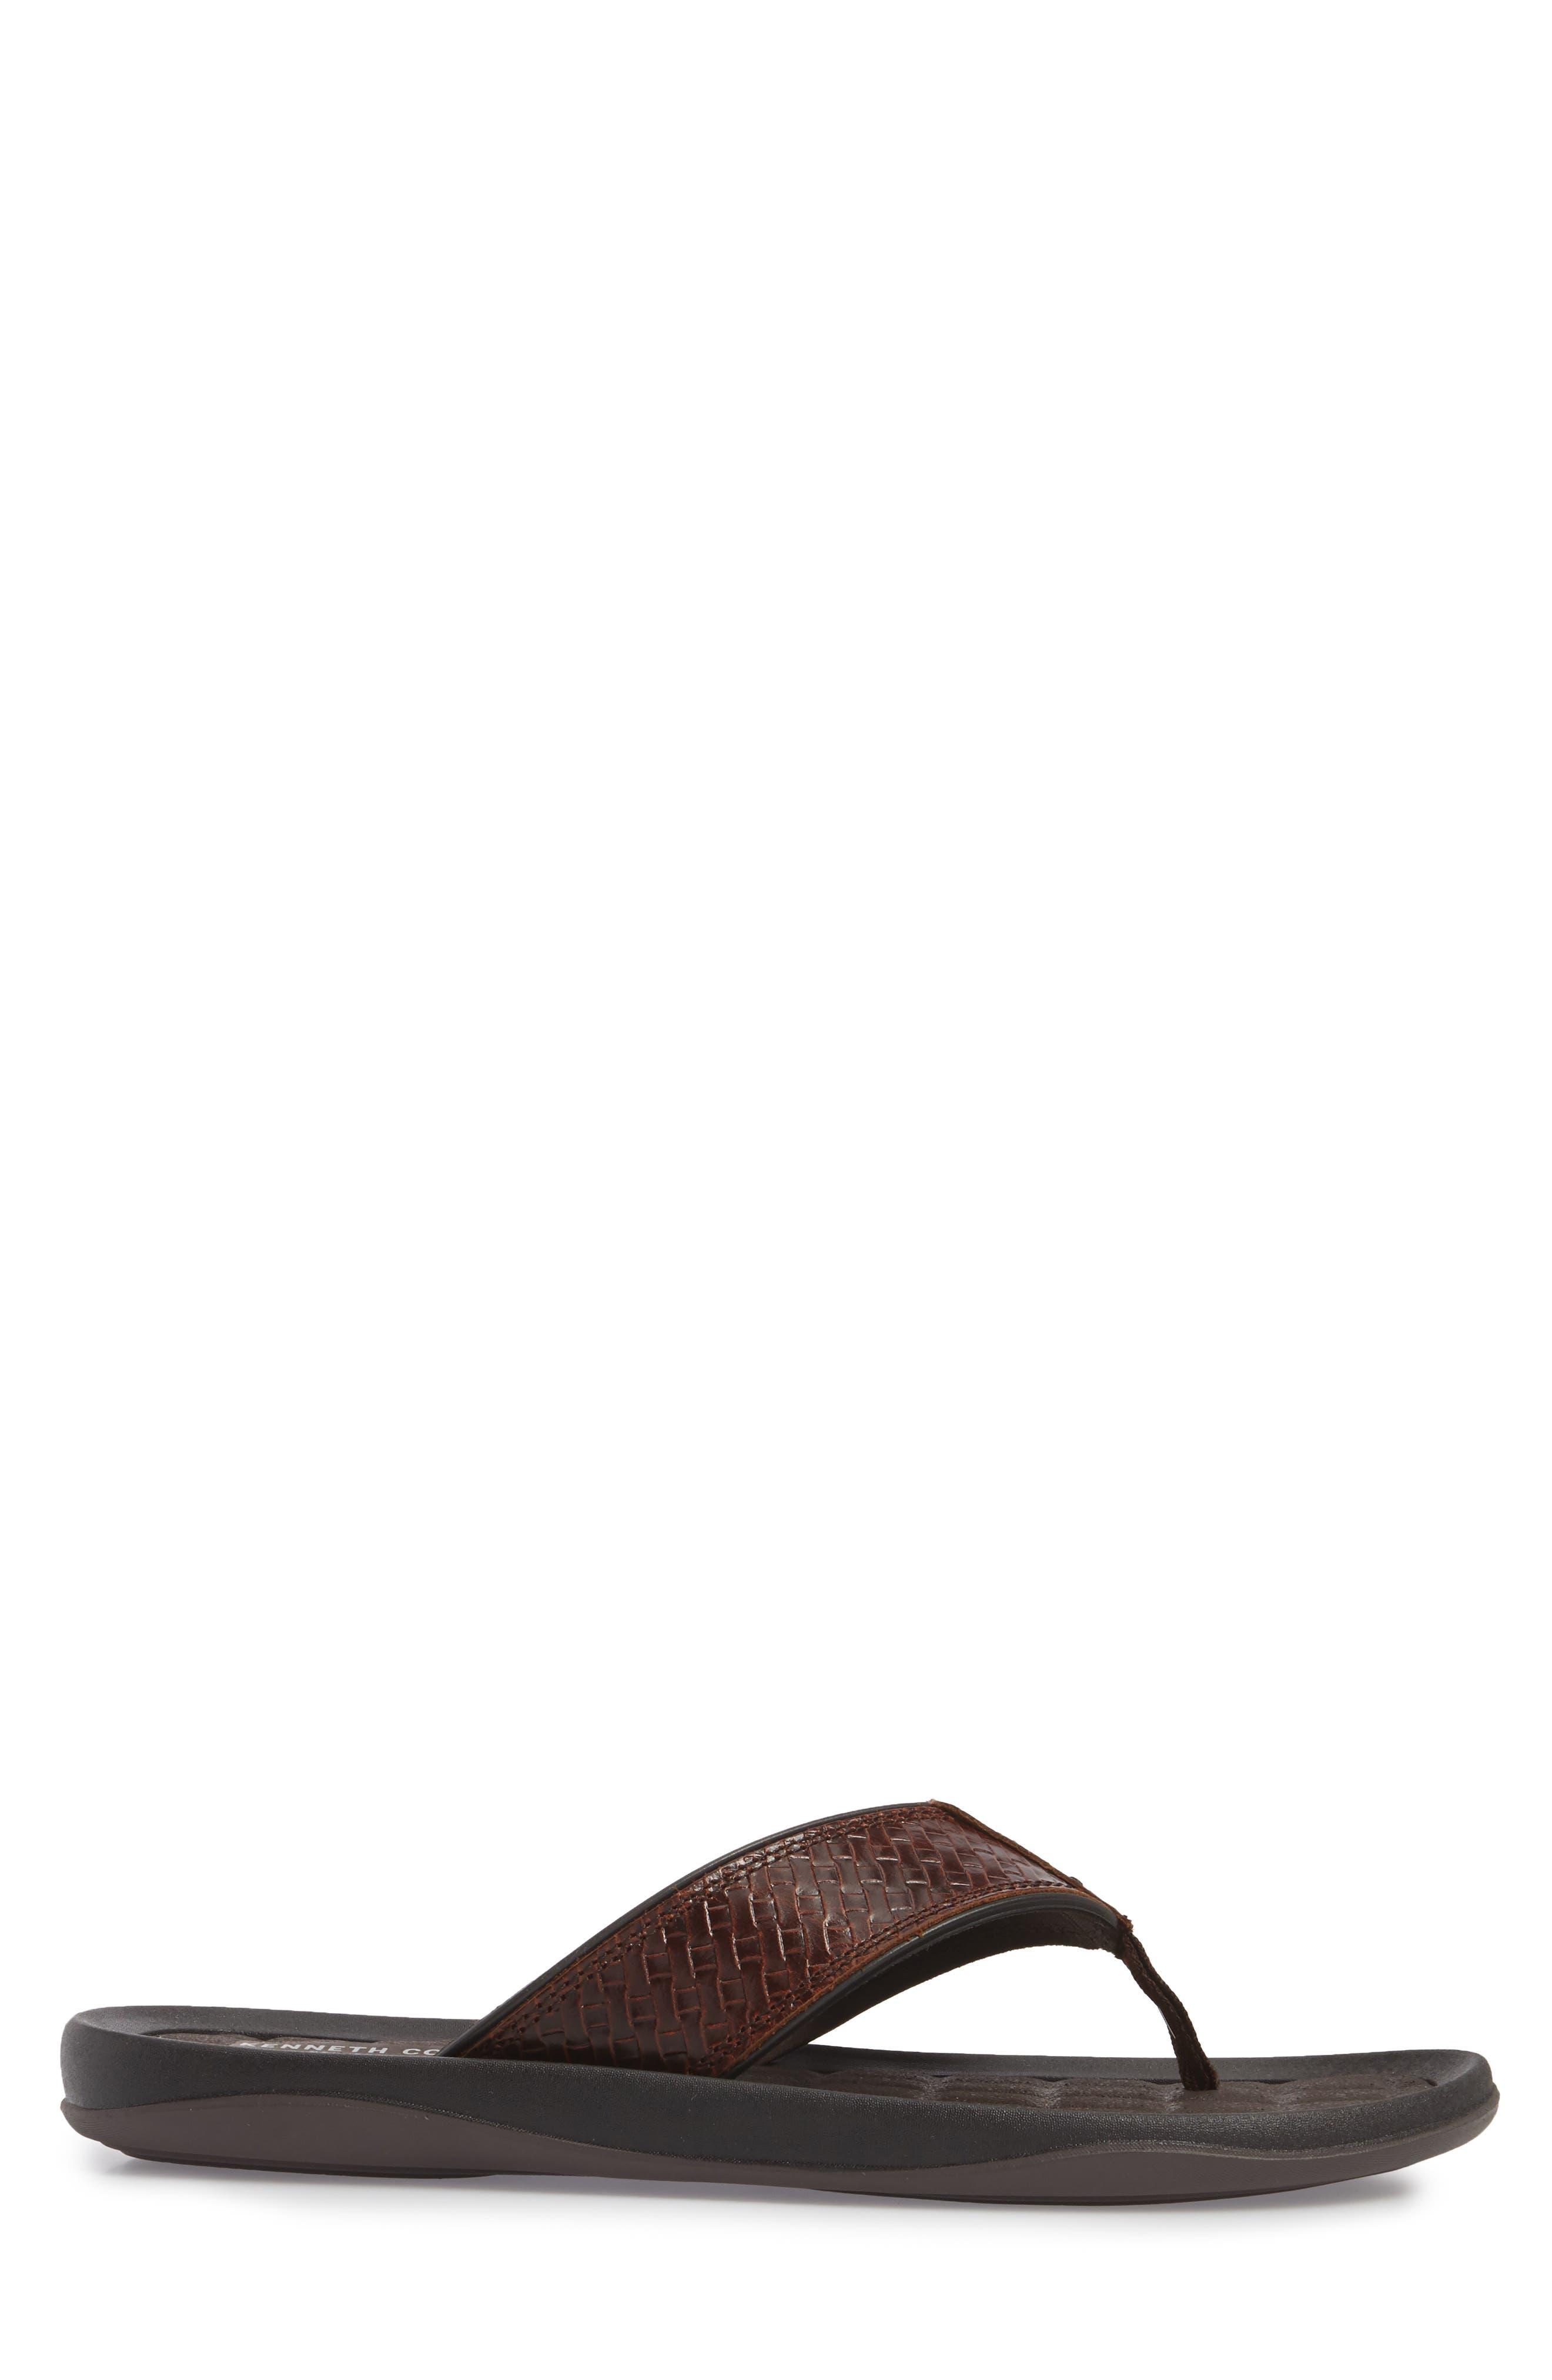 Alternate Image 3  - Kenneth Cole New York Izzo Embossed Flip Flop (Men)